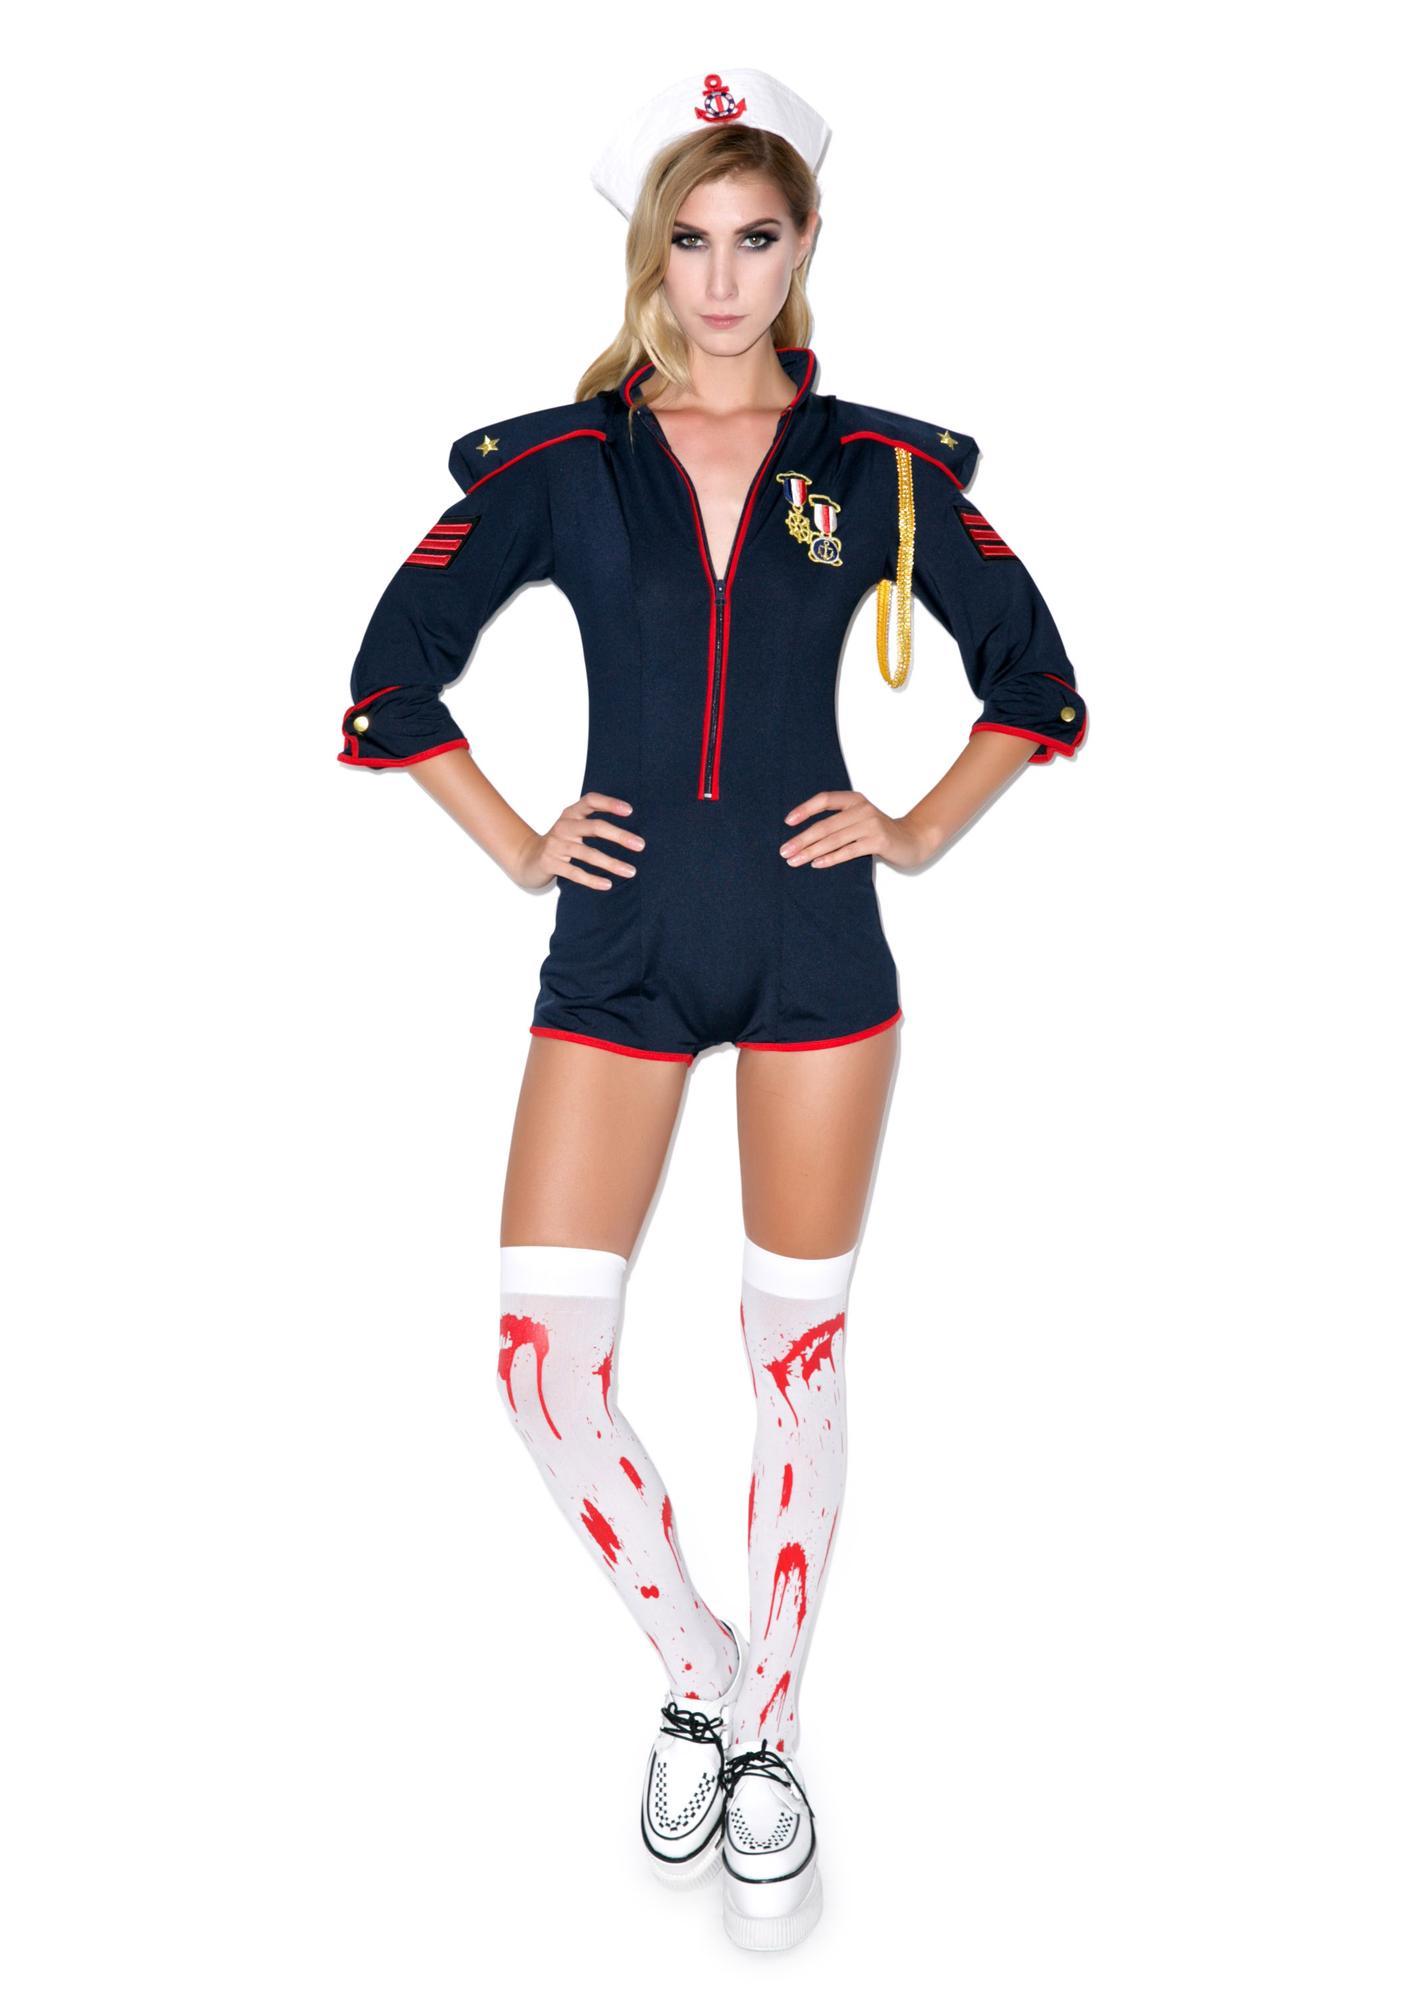 Fleet Captain Costume